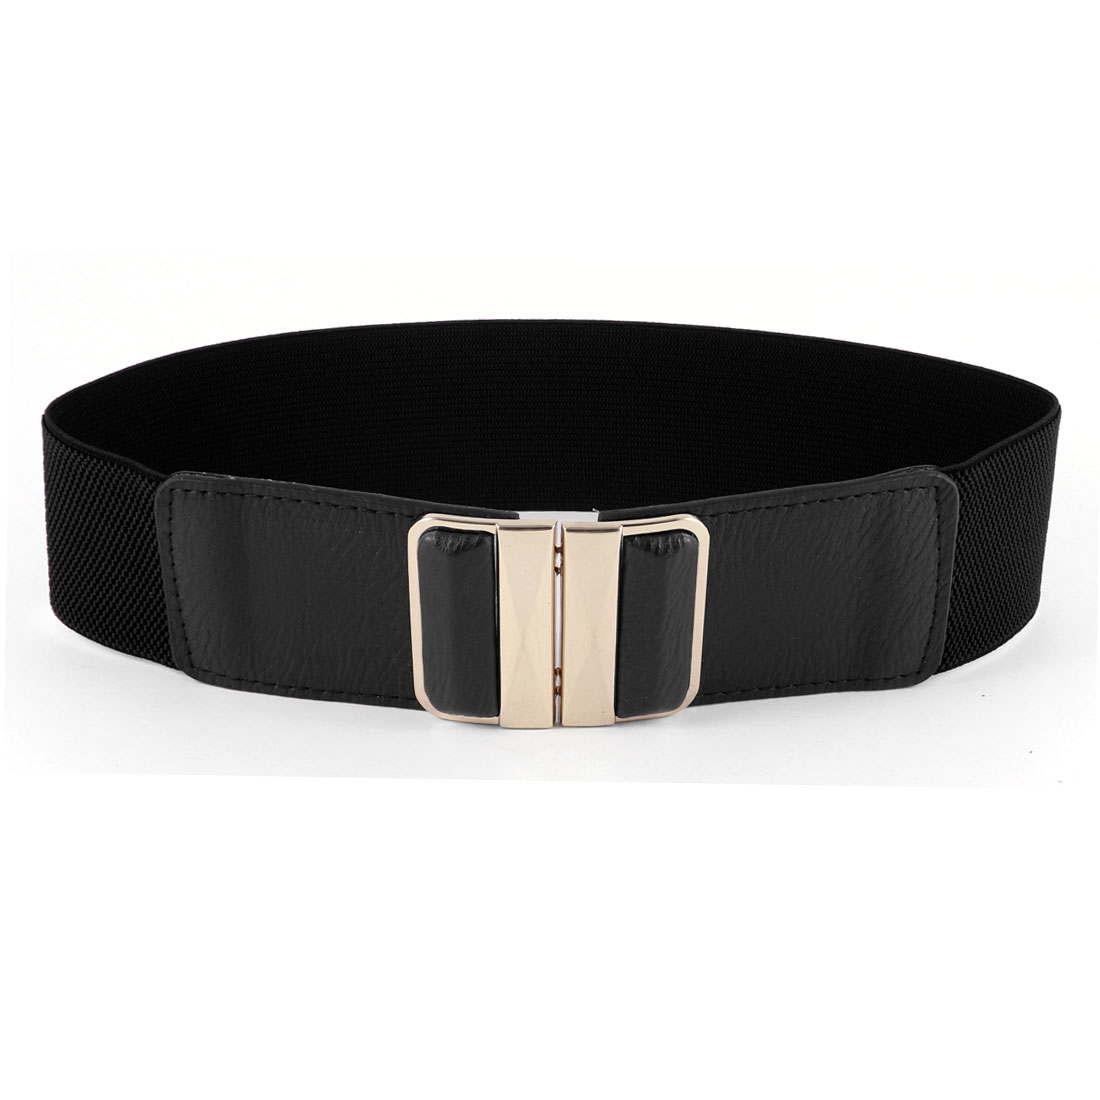 Lady Interlocking Buckle Black Faux Leather Textured Stretch Waist Belt 6CM Wide